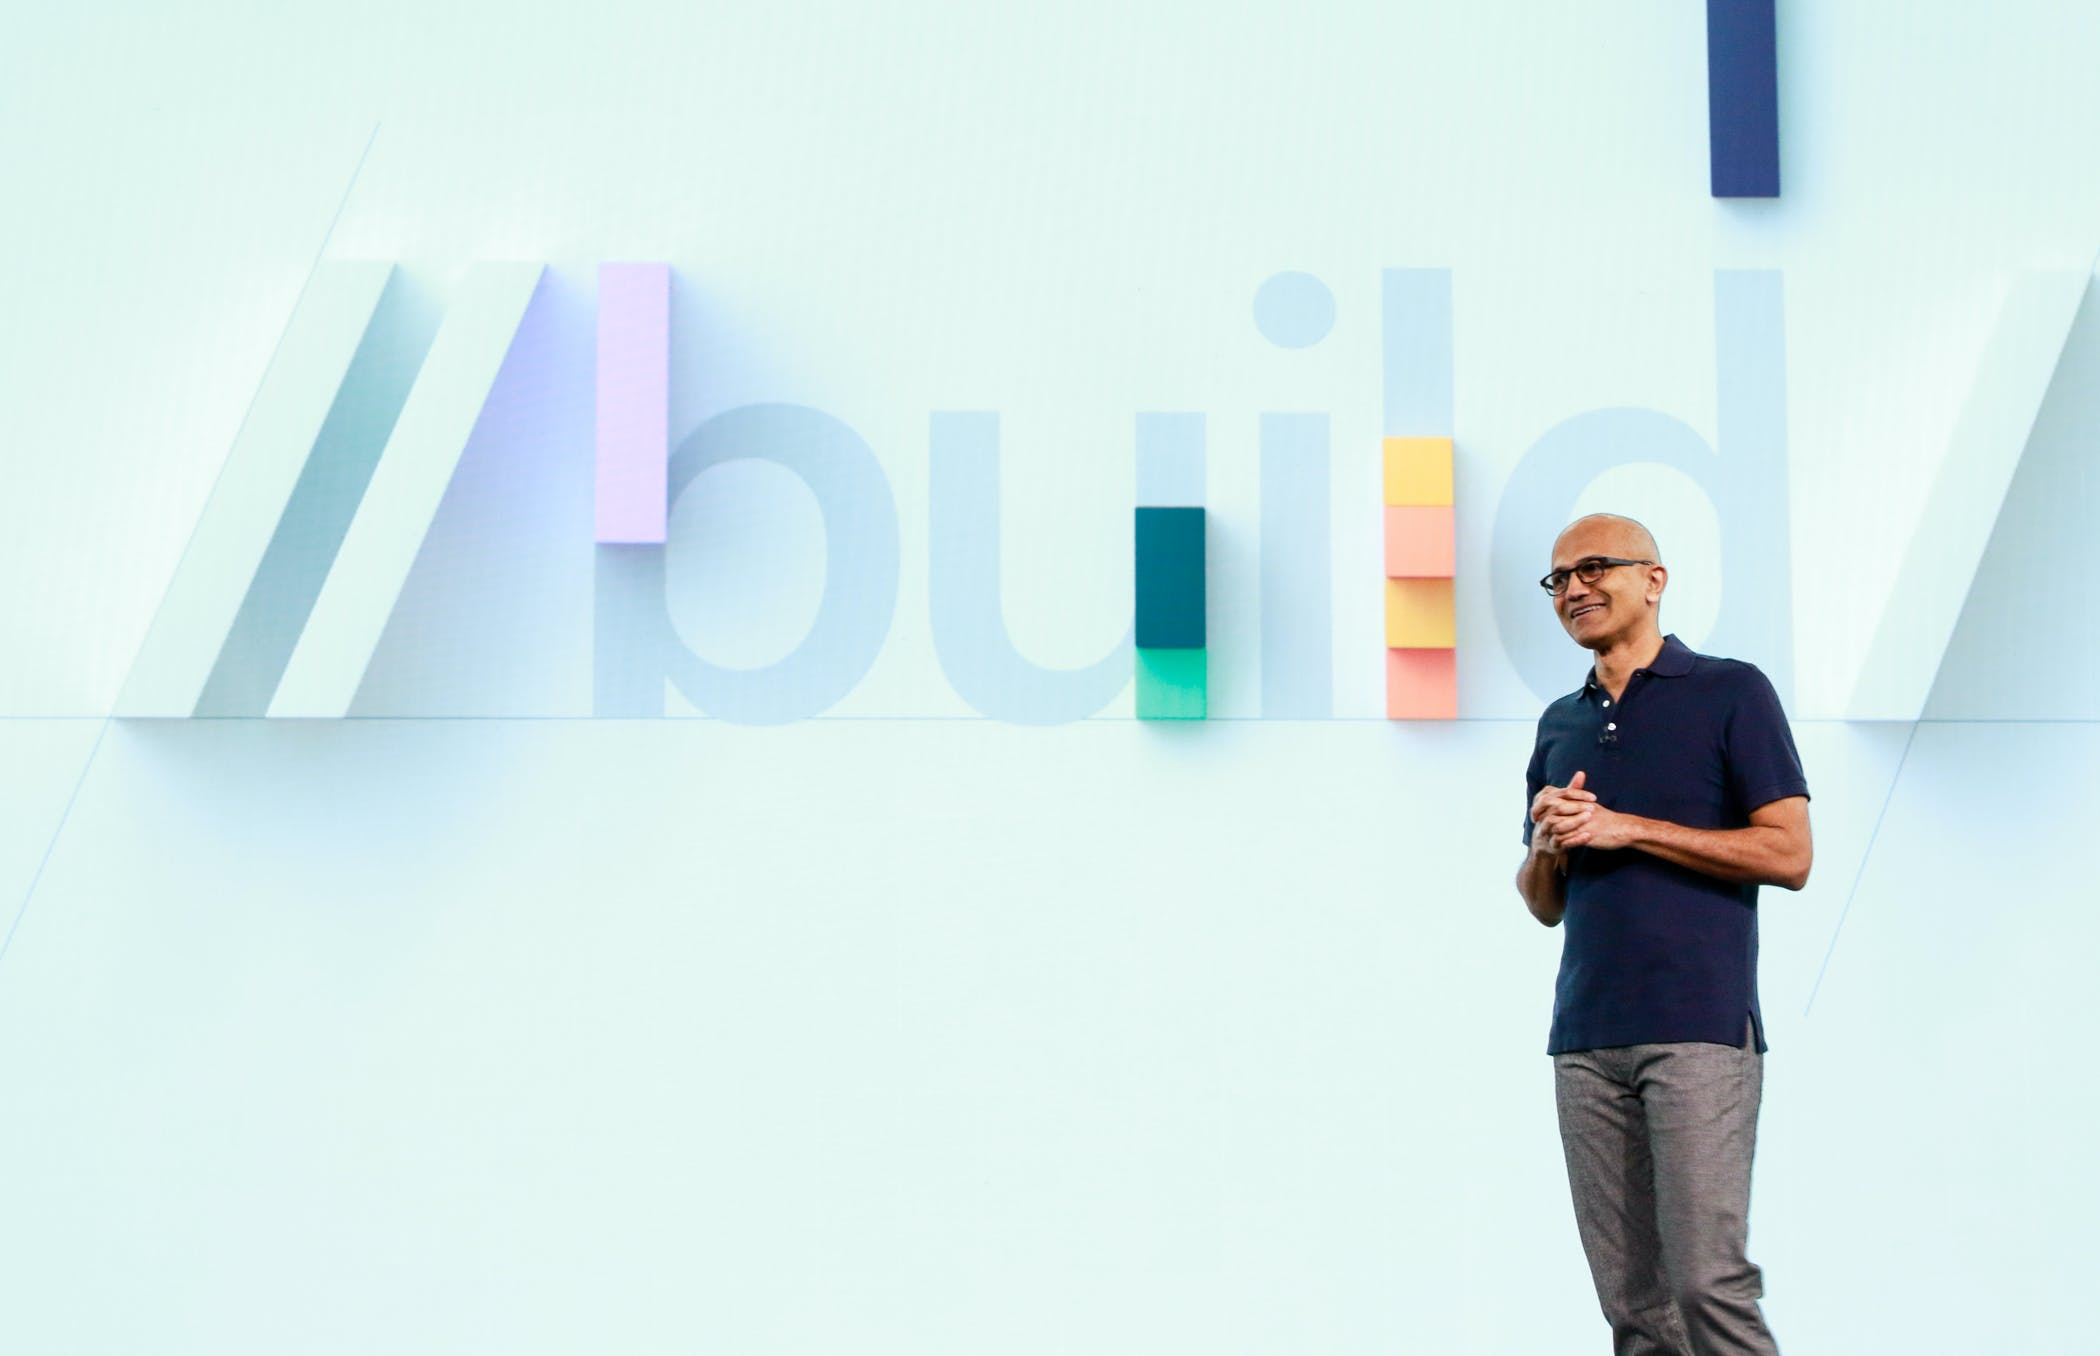 Titelbild-Microsoft-Build-2019-CEO-Satya-Nadella-Keynote-c-Microsoft